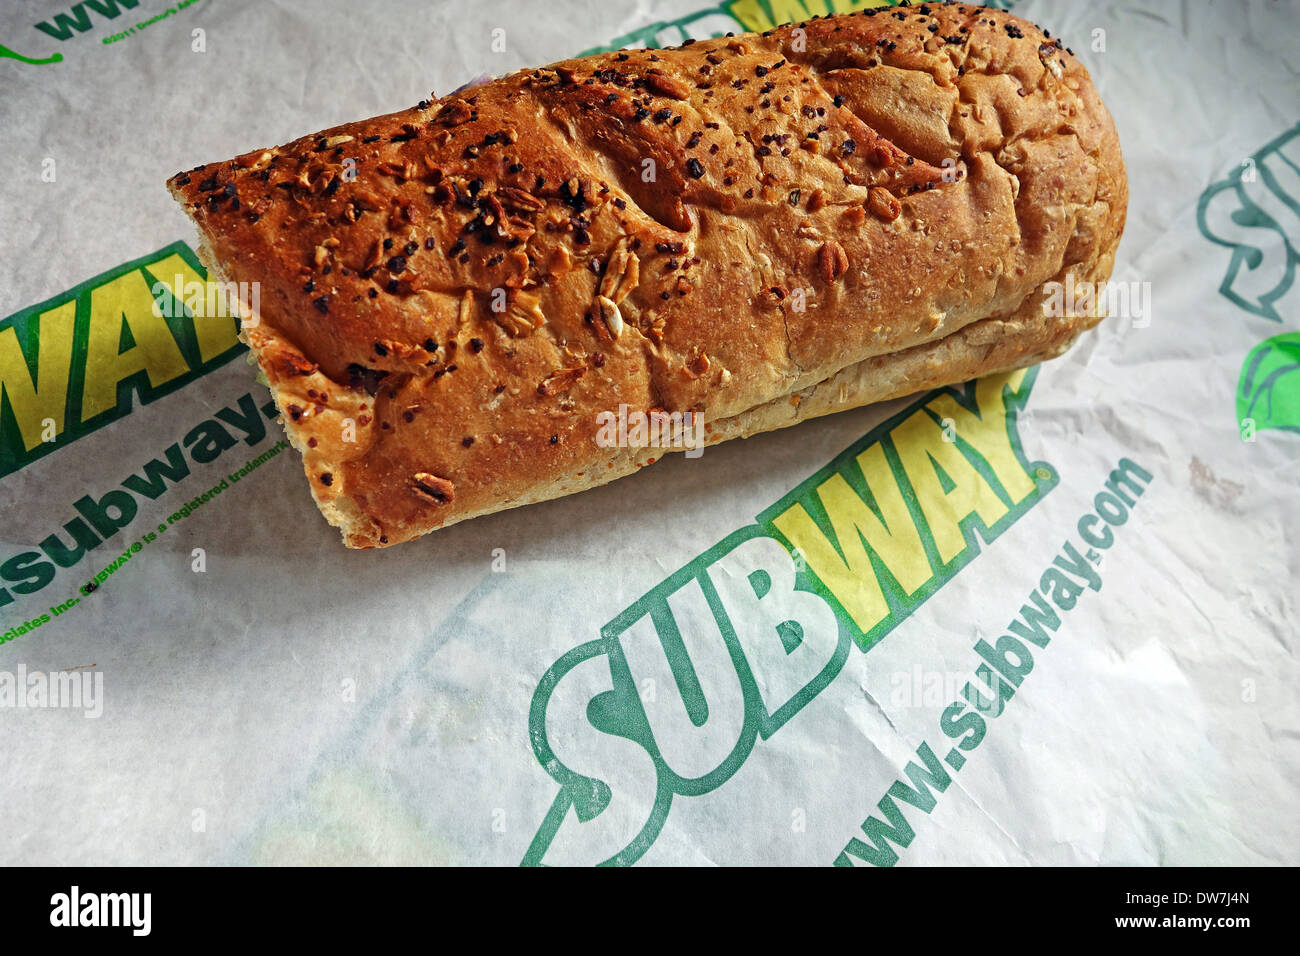 Sandwich Subway Company Photo Stock